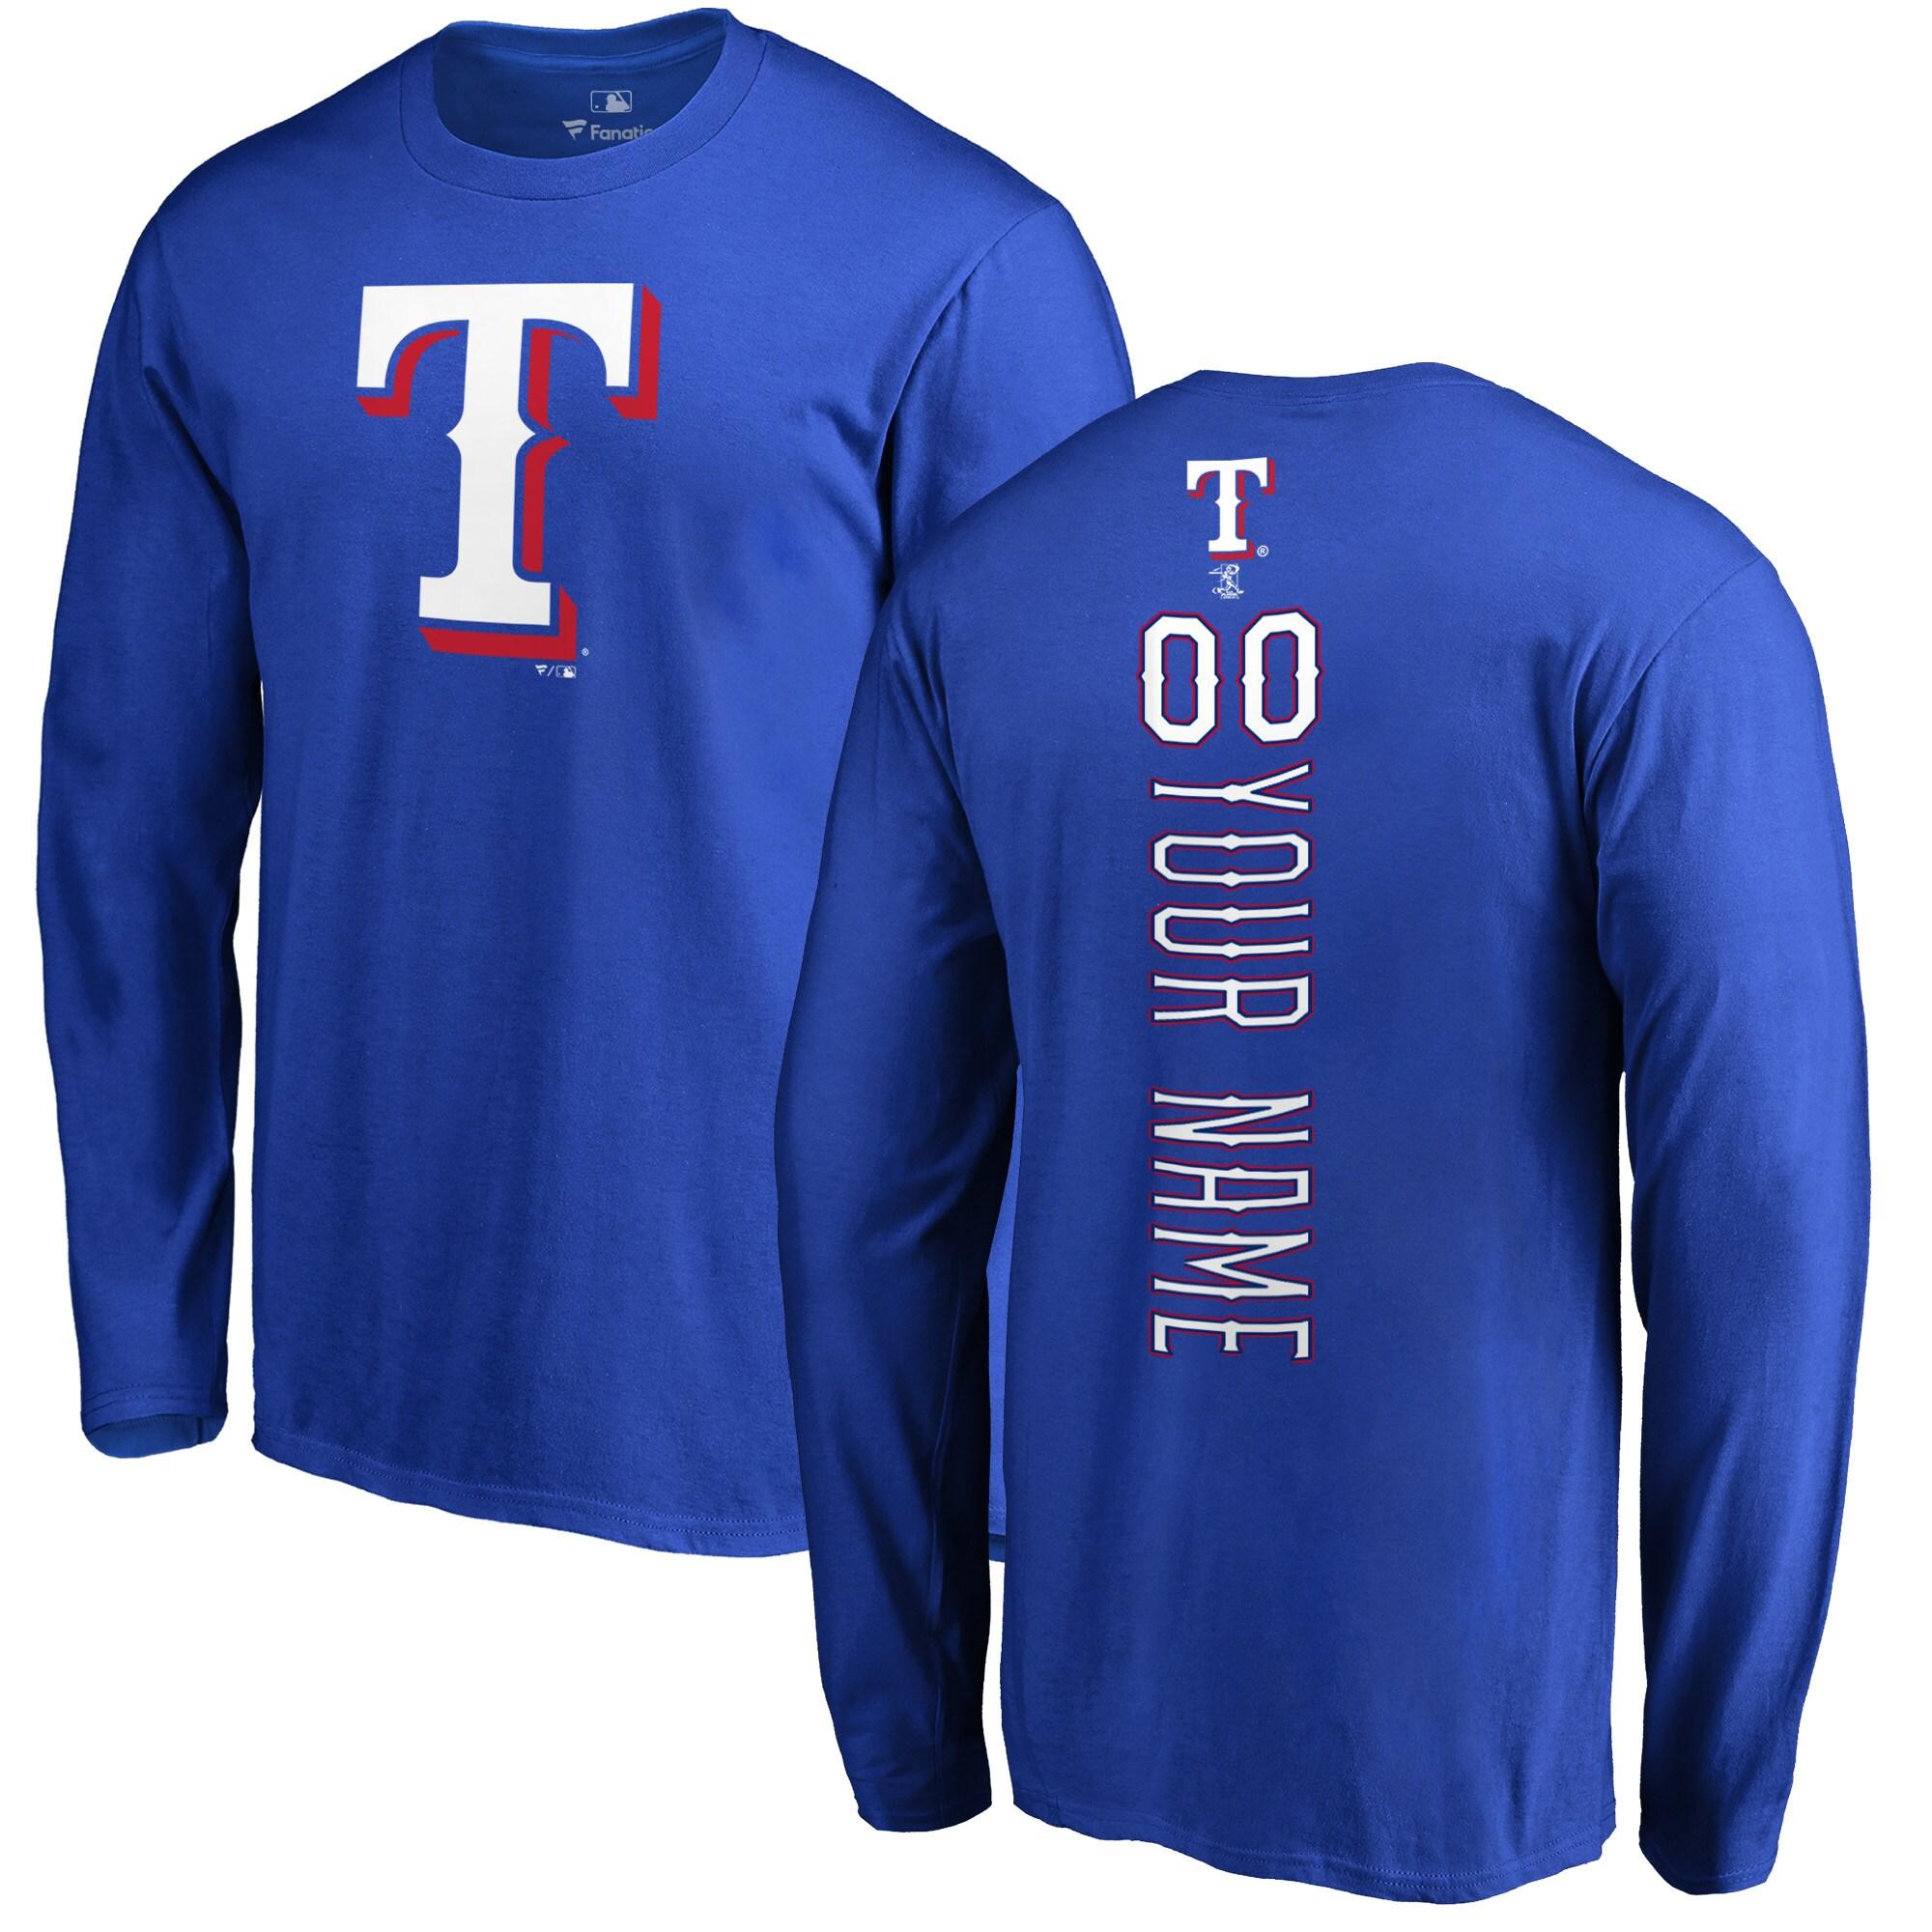 Texas Rangers Fanatics Branded Personalized Playmaker Long Sleeve T-Shirt - Royal